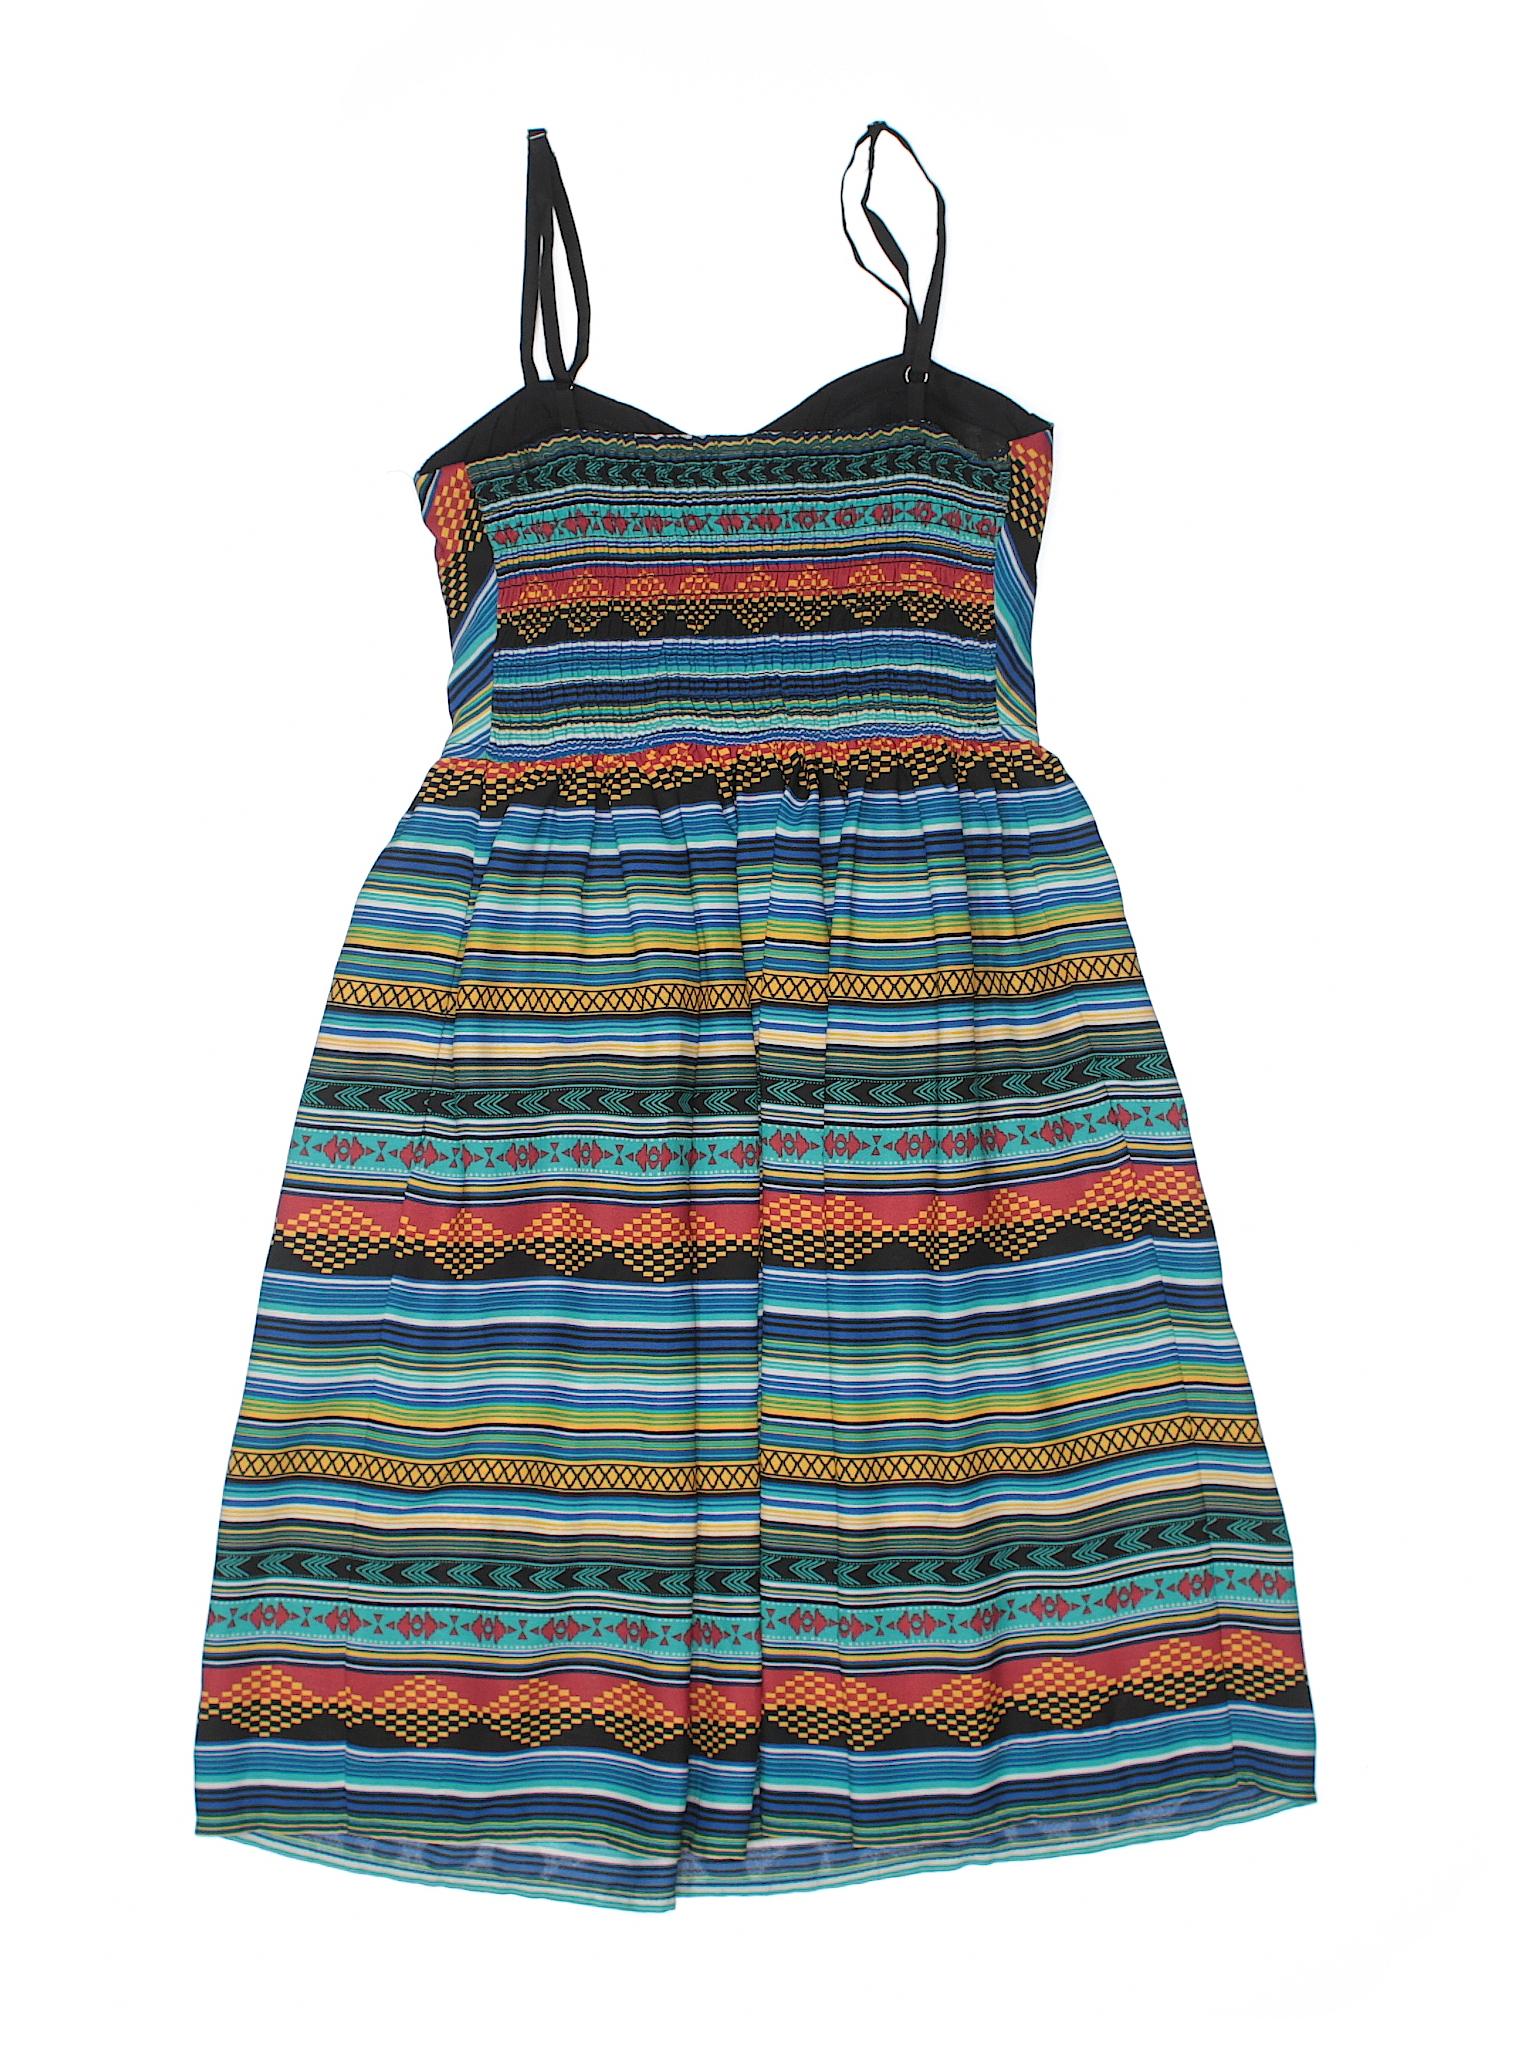 winter winter Boutique Boutique Dress Casual Xhilaration winter Casual Boutique Dress Xhilaration TqR5pFTw